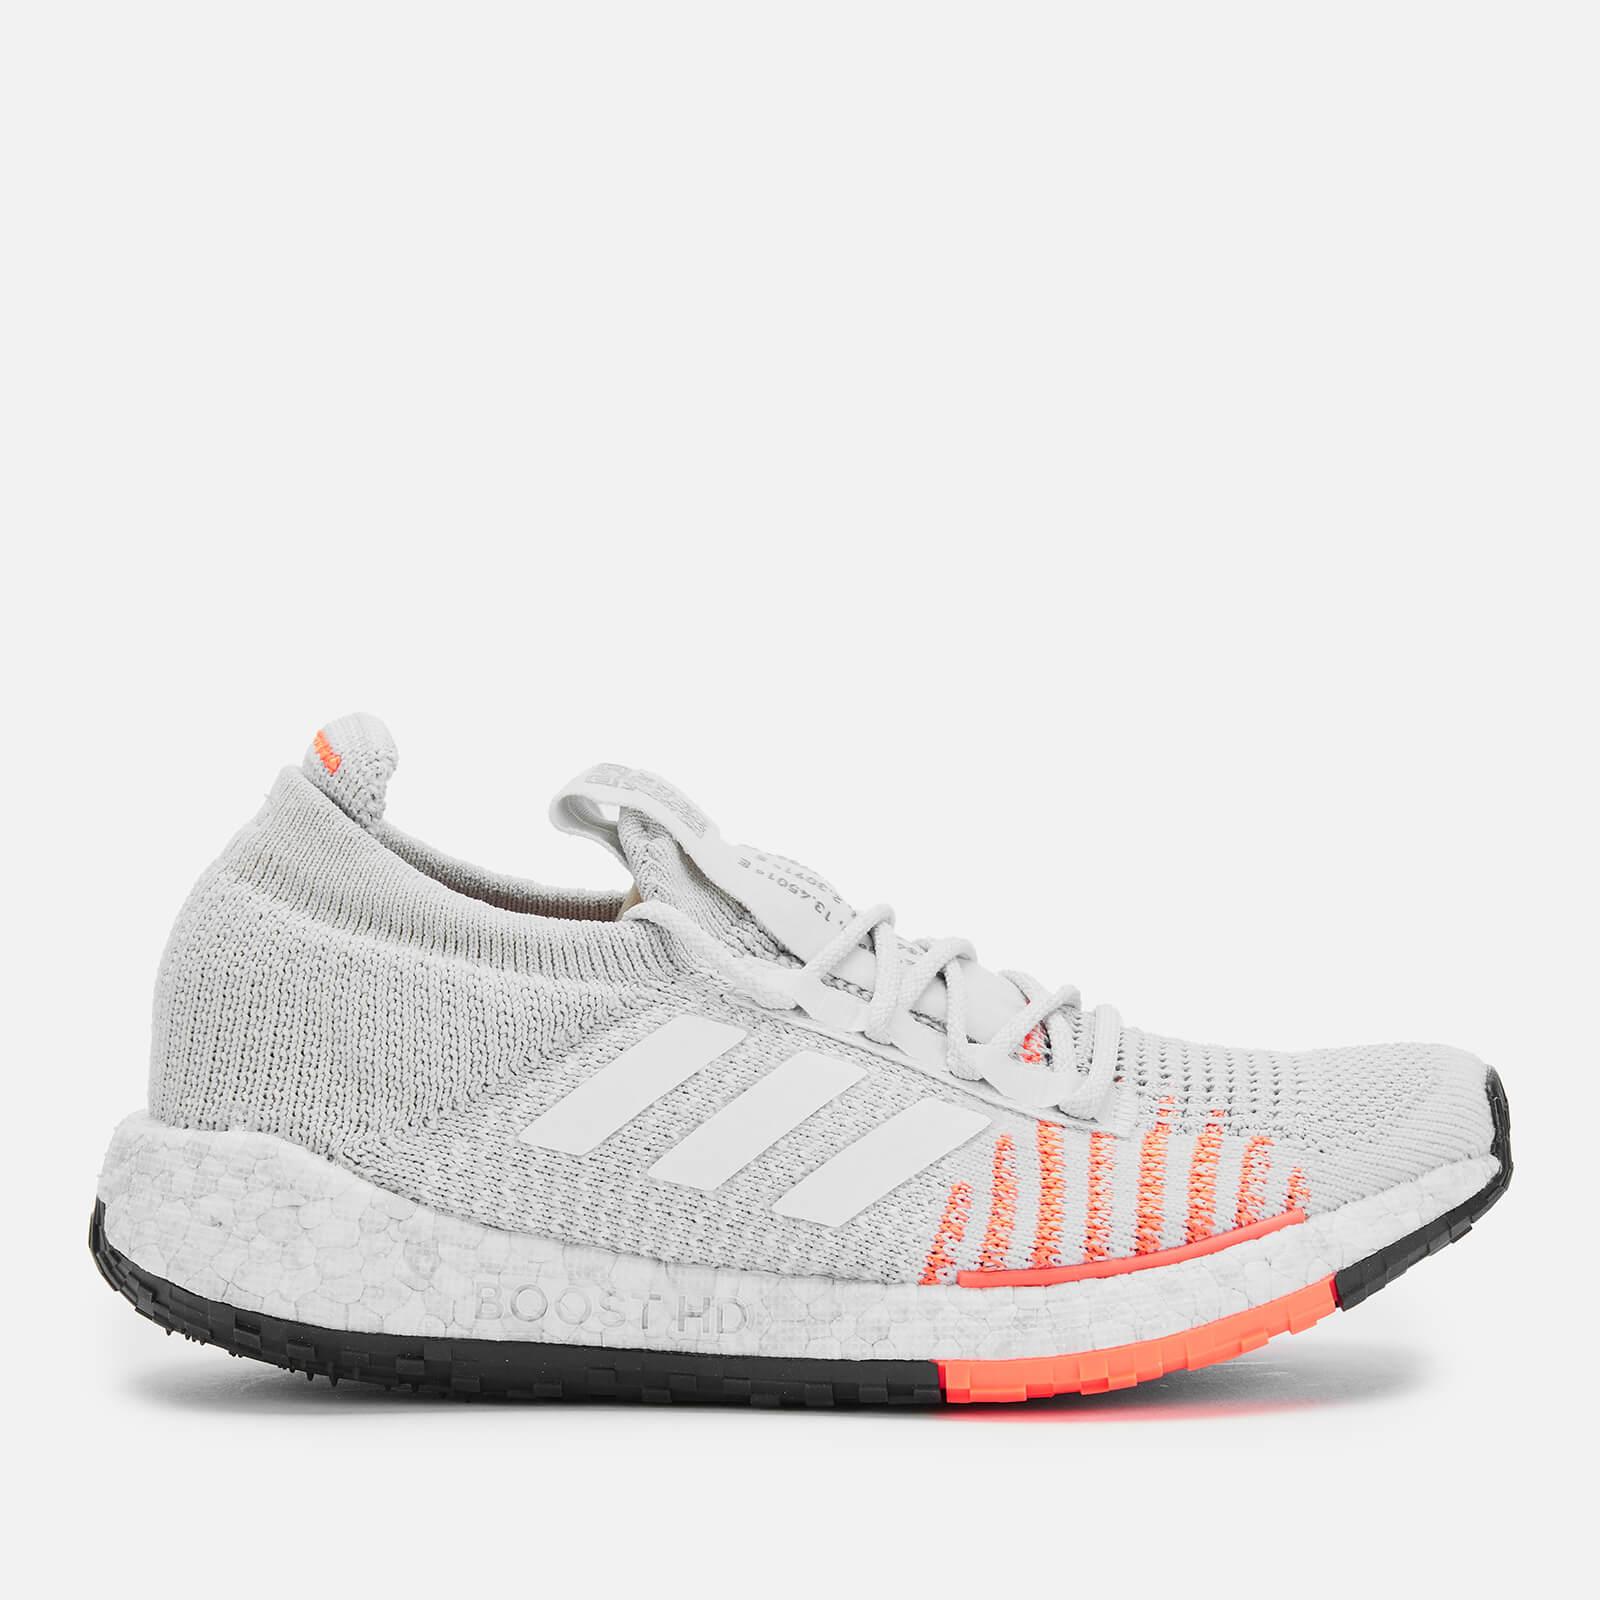 adidas Women's Pulse Boost HD Trainers - Grey/Orange - UK 7 - Grey